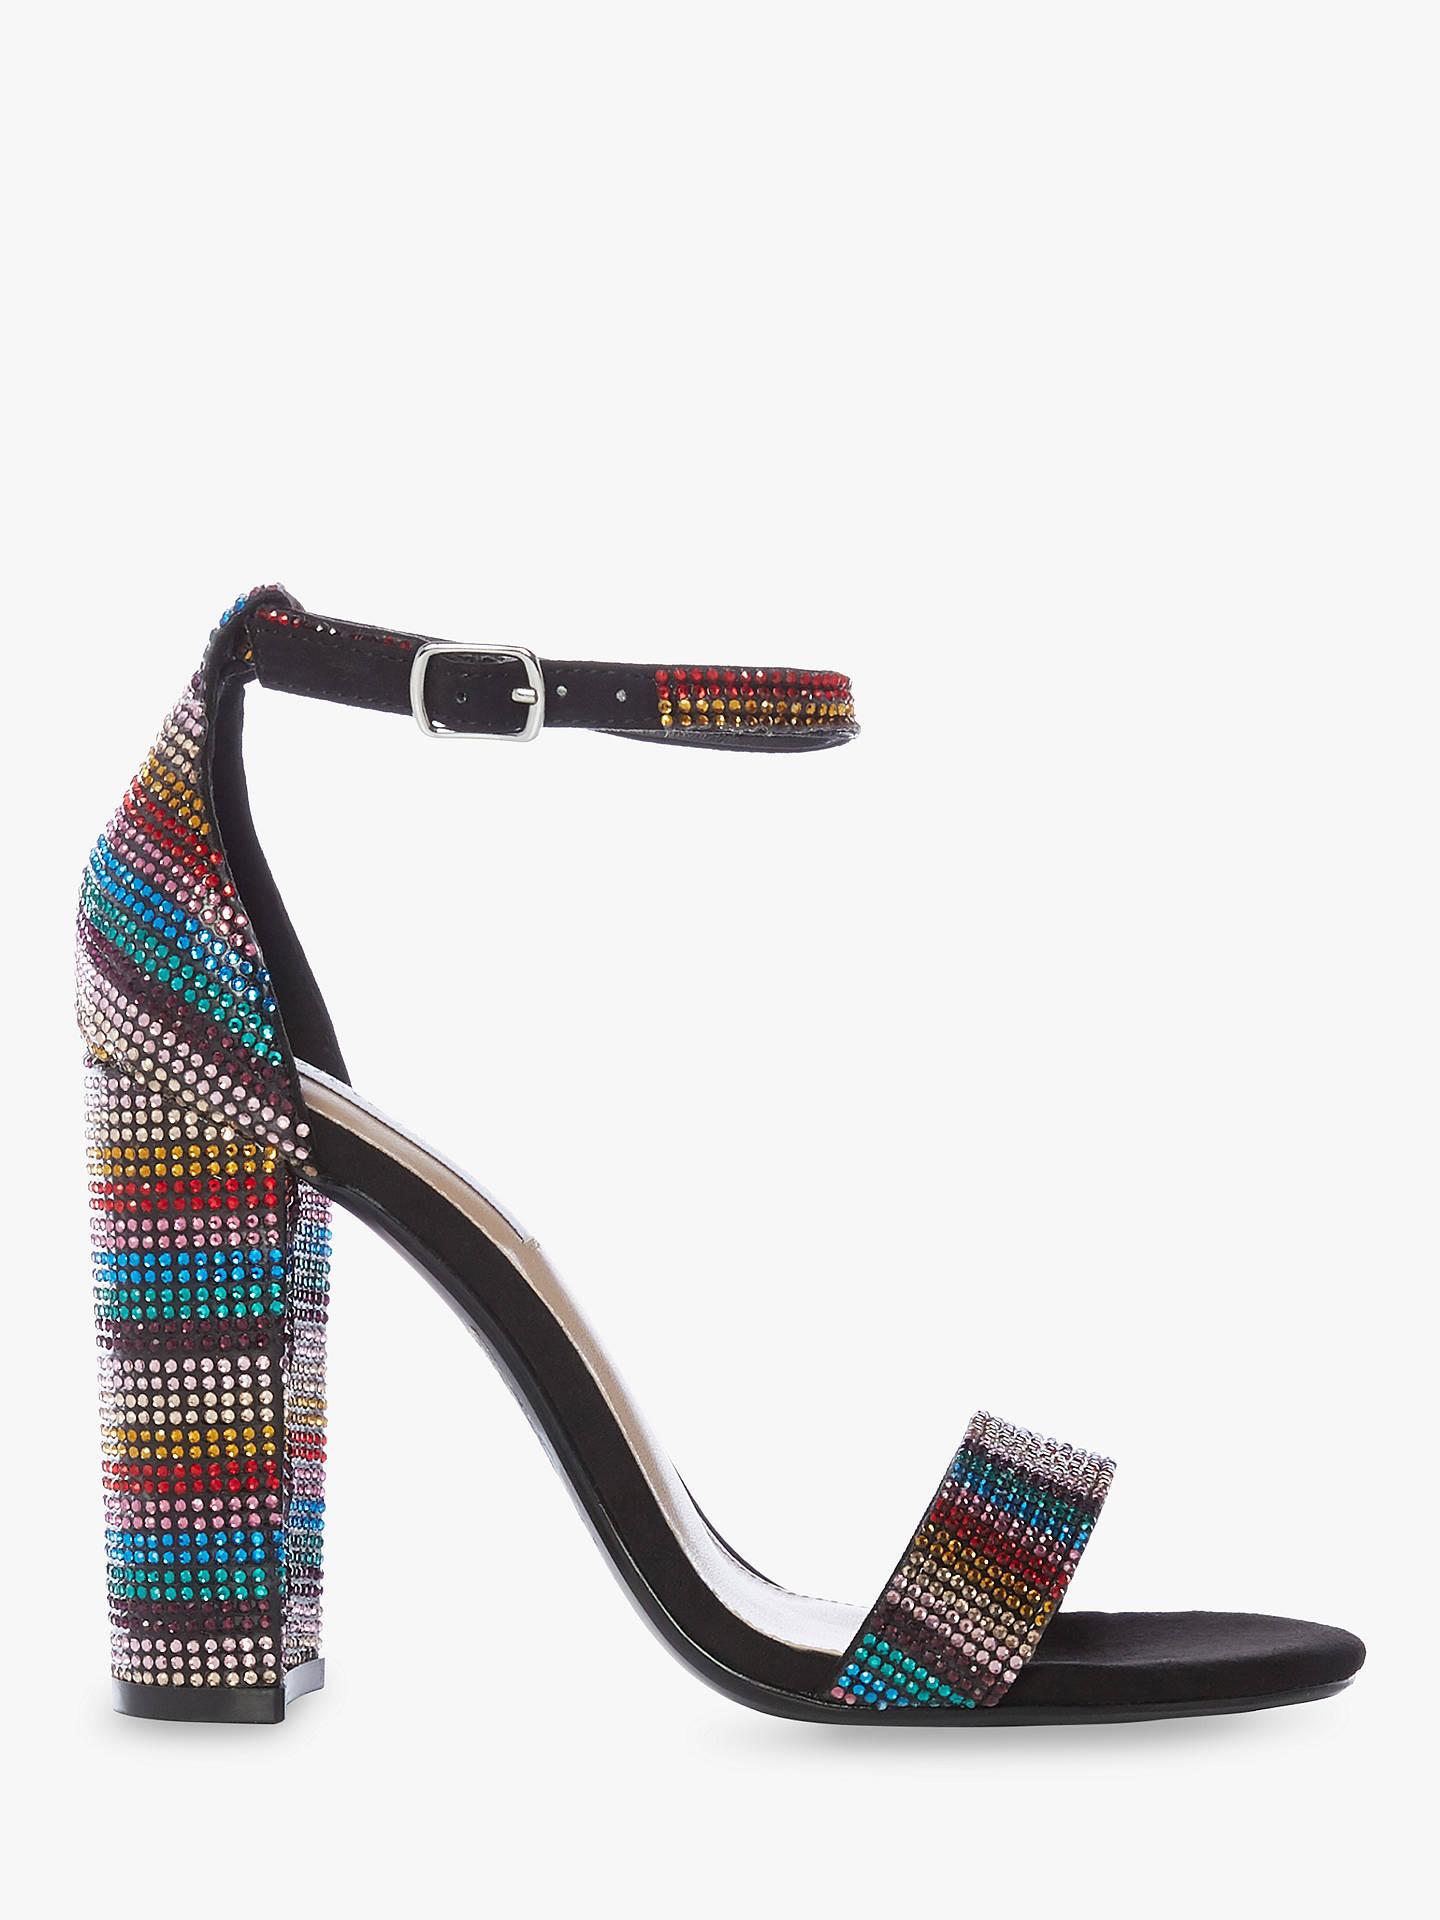 3715d412714 Steve Madden Carrson Two Part Block Heel Sandals, Multi